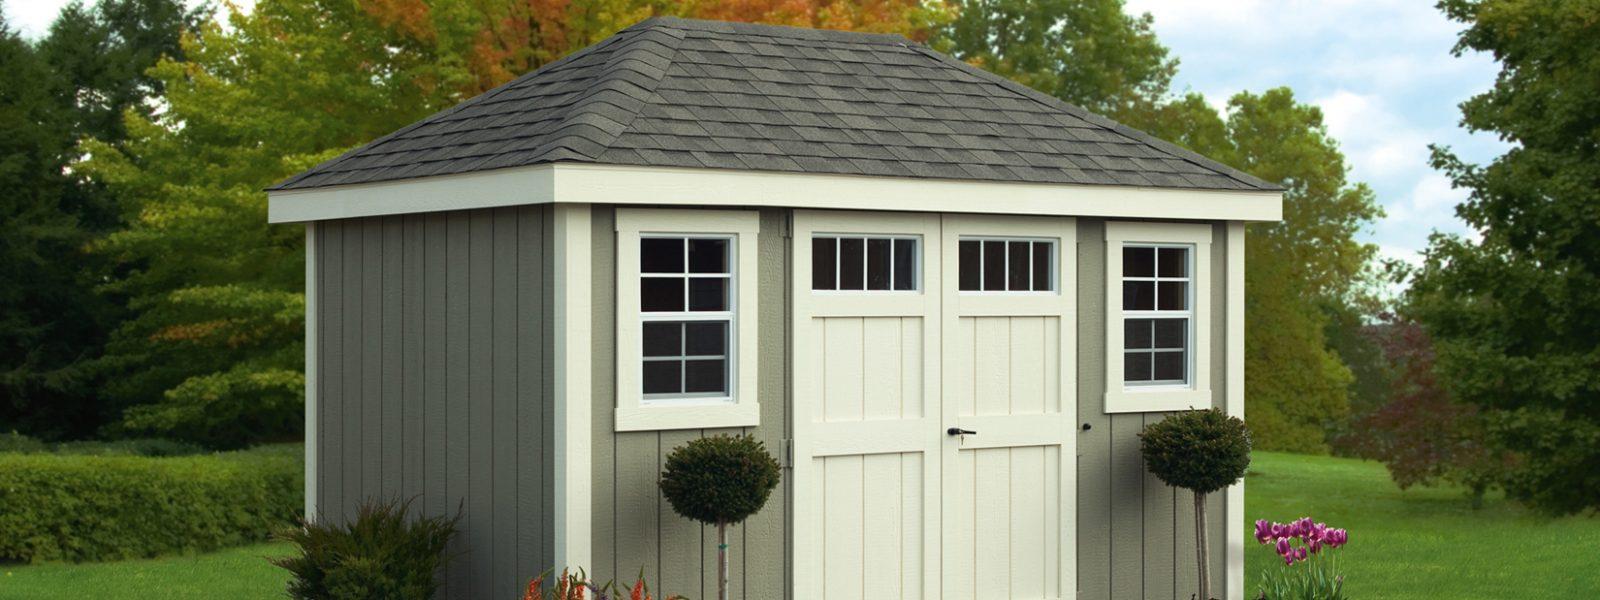 outdoor storage sheds st cloud Minnesota